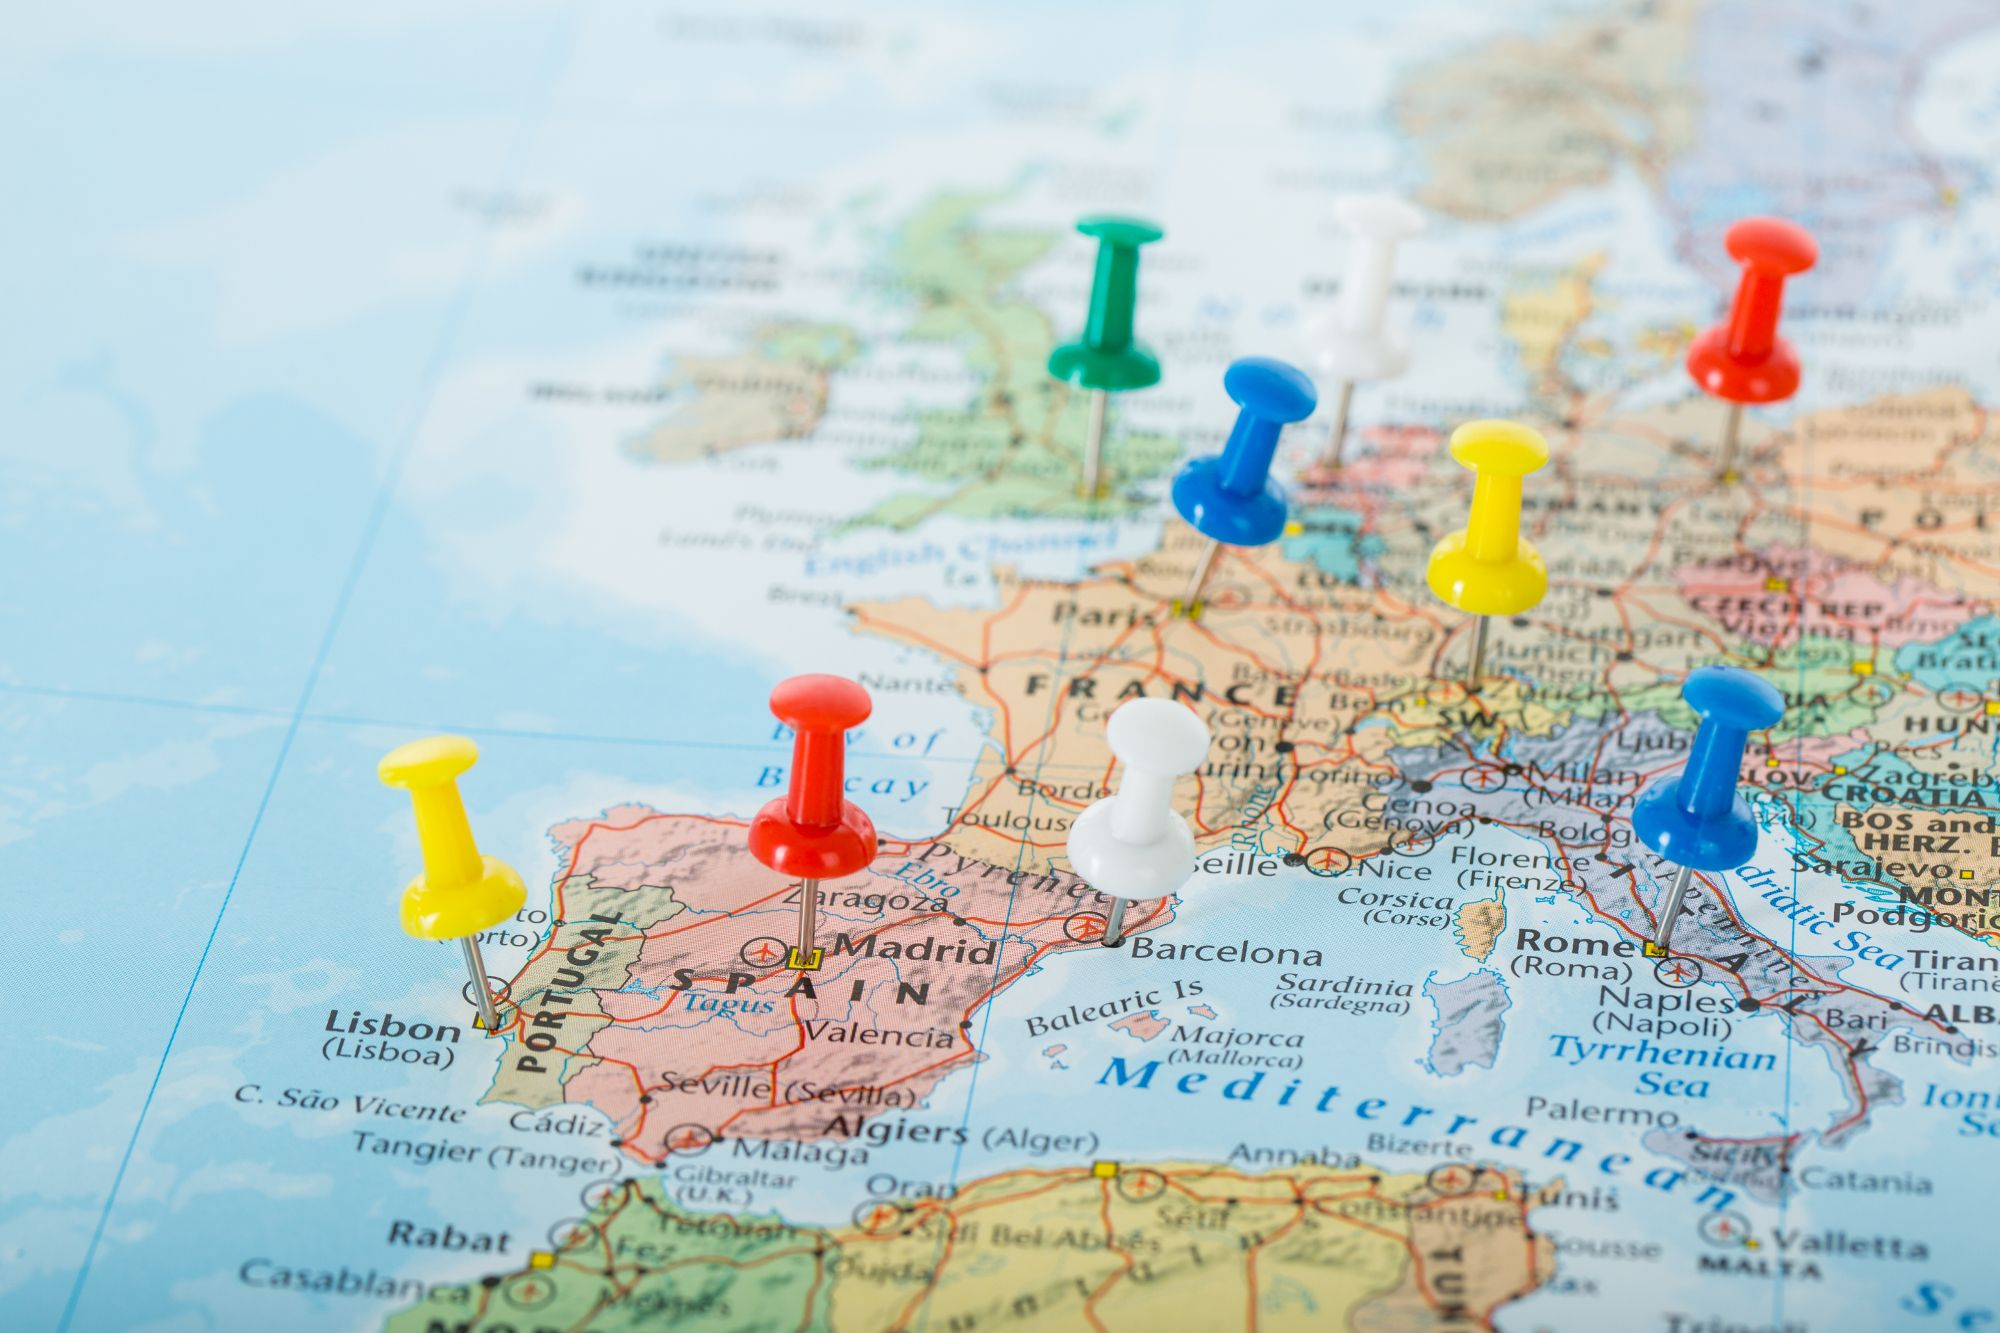 ETIAS Visa to Europe for US Citizens - Travel Hymns